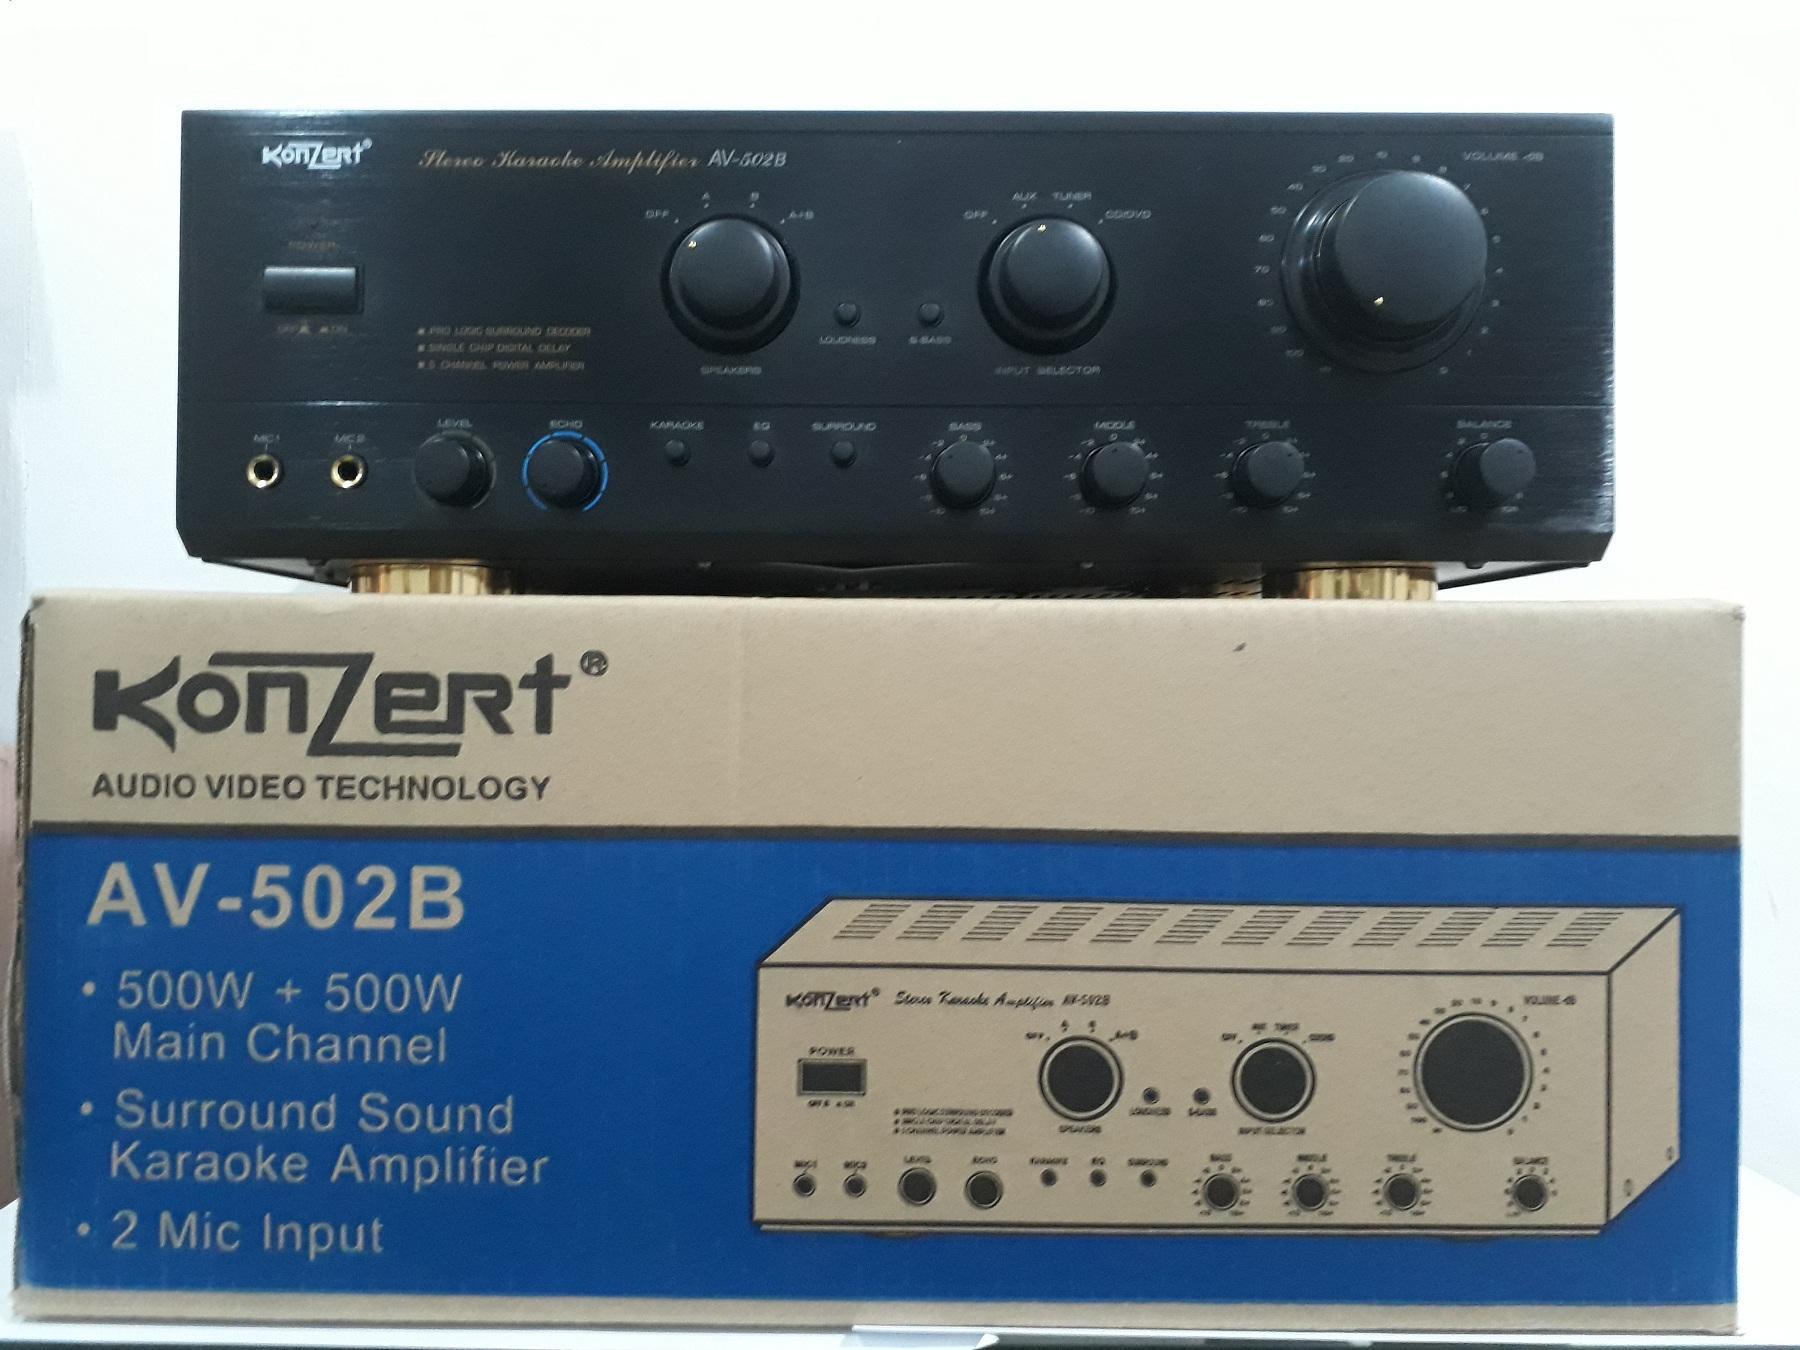 How To Make An Amplifier 200 Watts Using Stk4141 With Diagram 2x25w Stereo Power Stk4141ii Circuit Konzert Av 502b